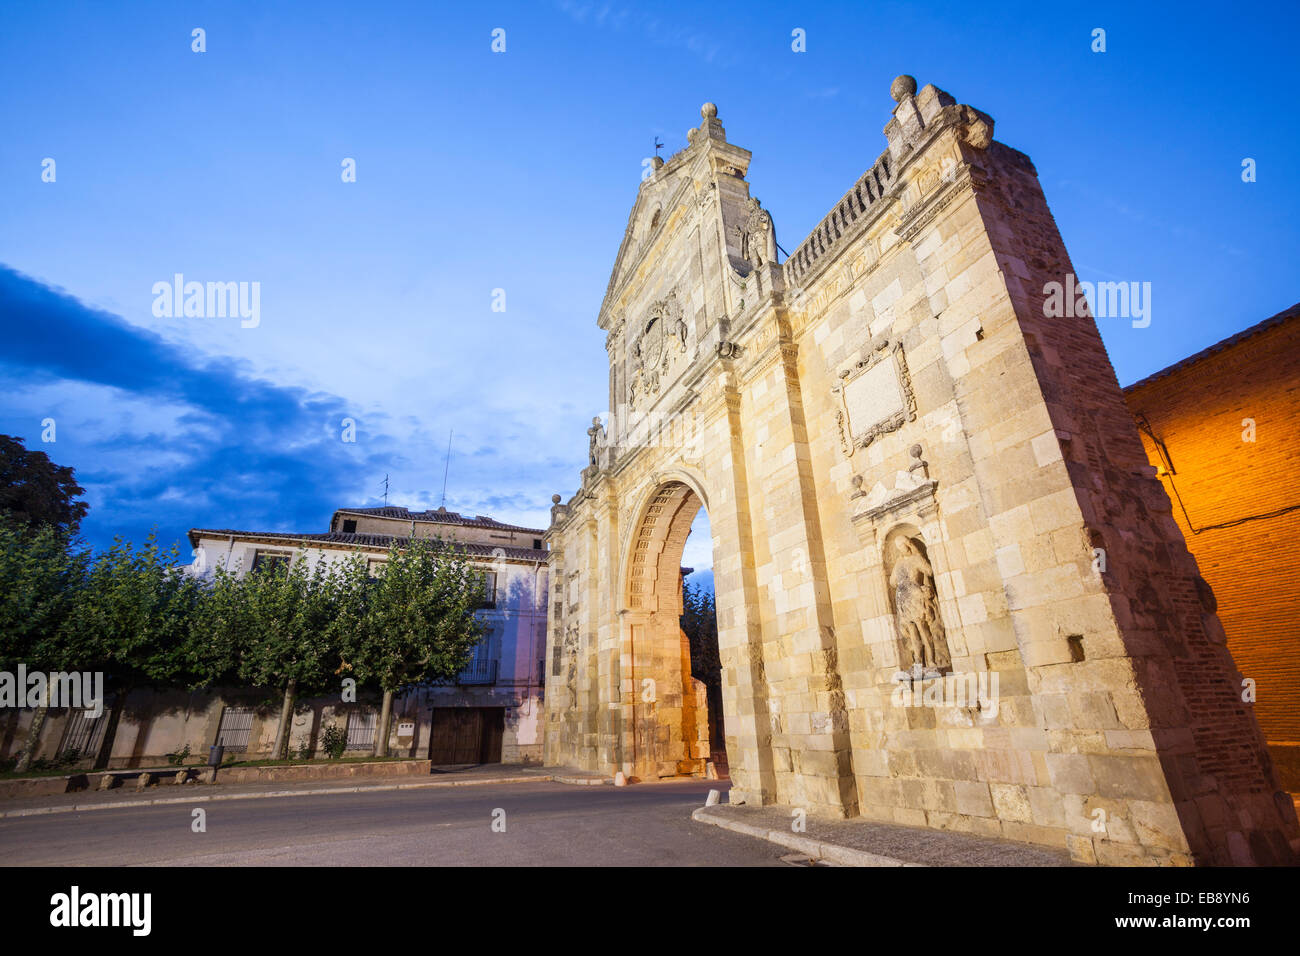 San Benito Arch in Sahagun, Way of St. James, Leon, Spain - Stock Image